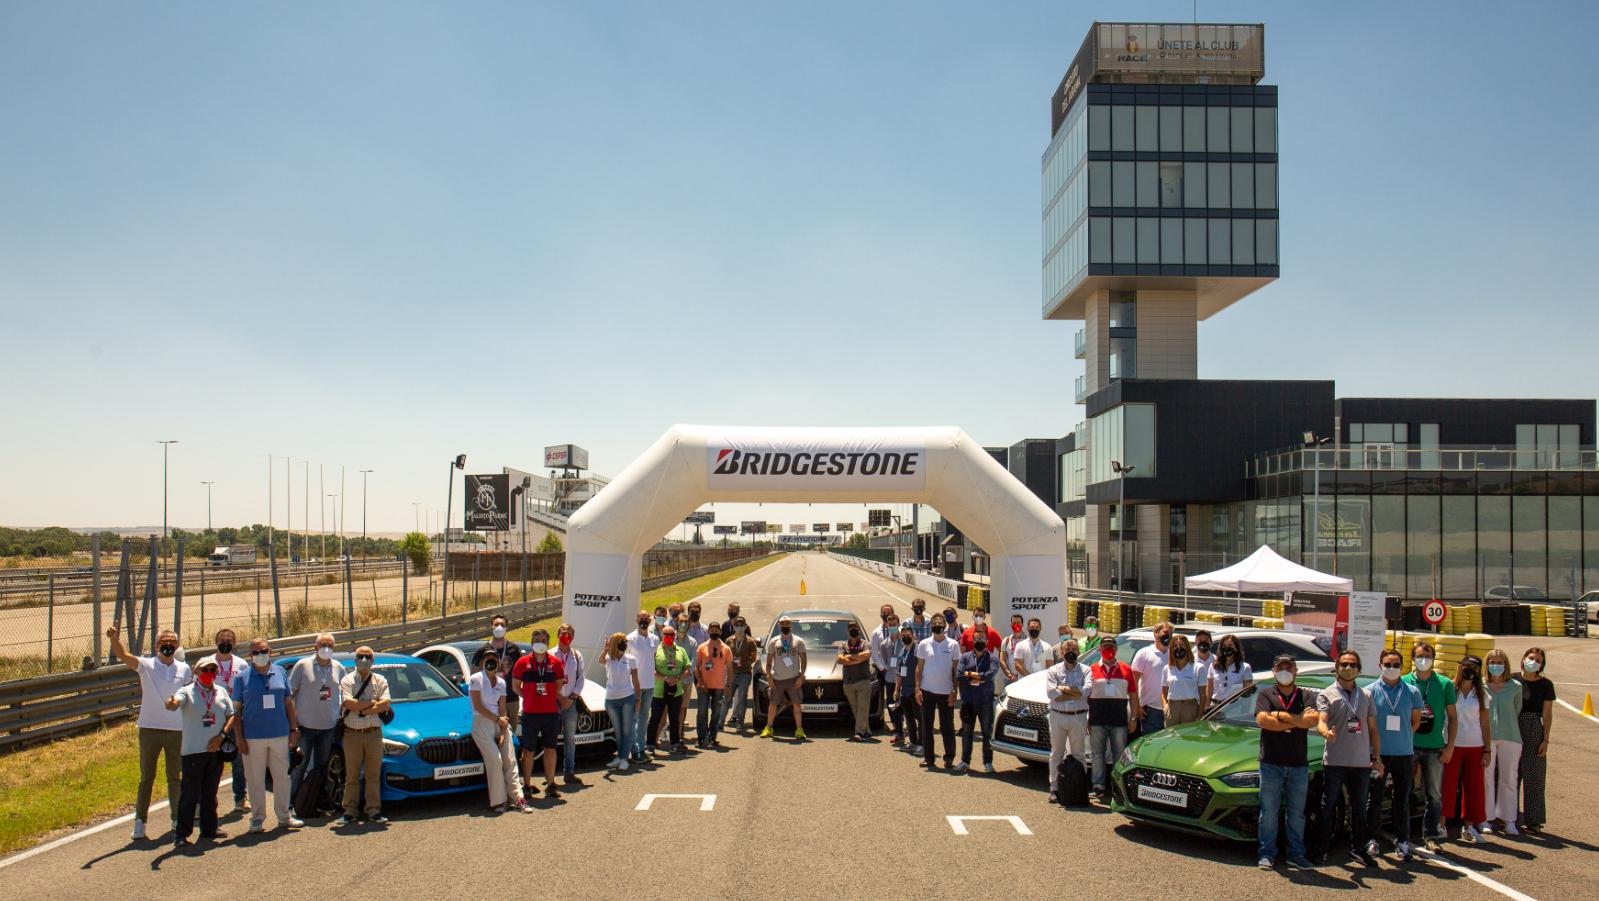 bridgestone-potenza-sport-jarama